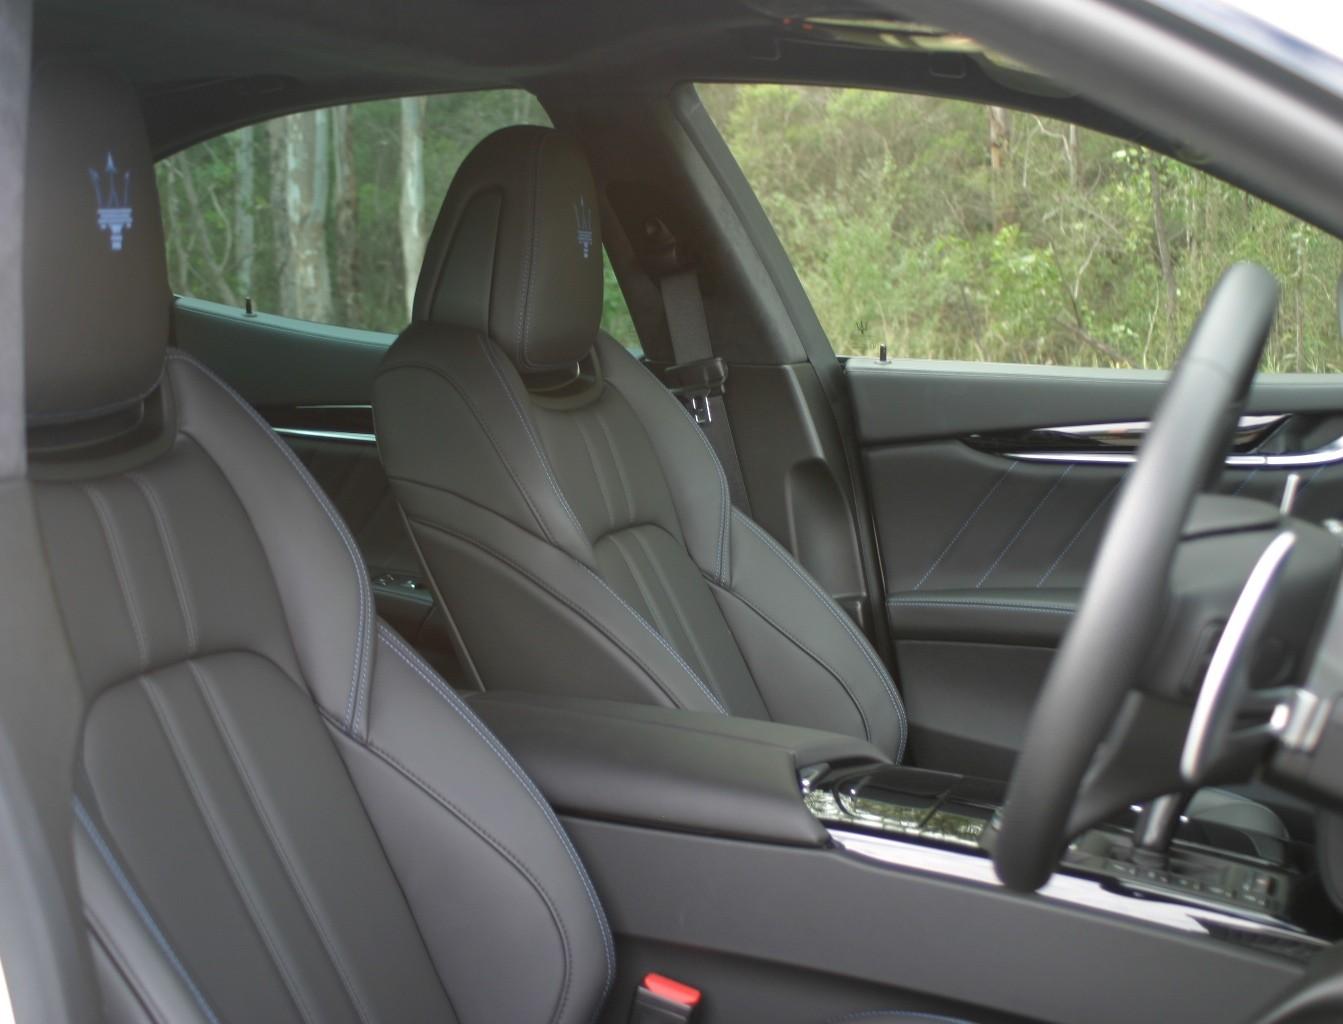 Maserati Ghibli Hybrid front seat